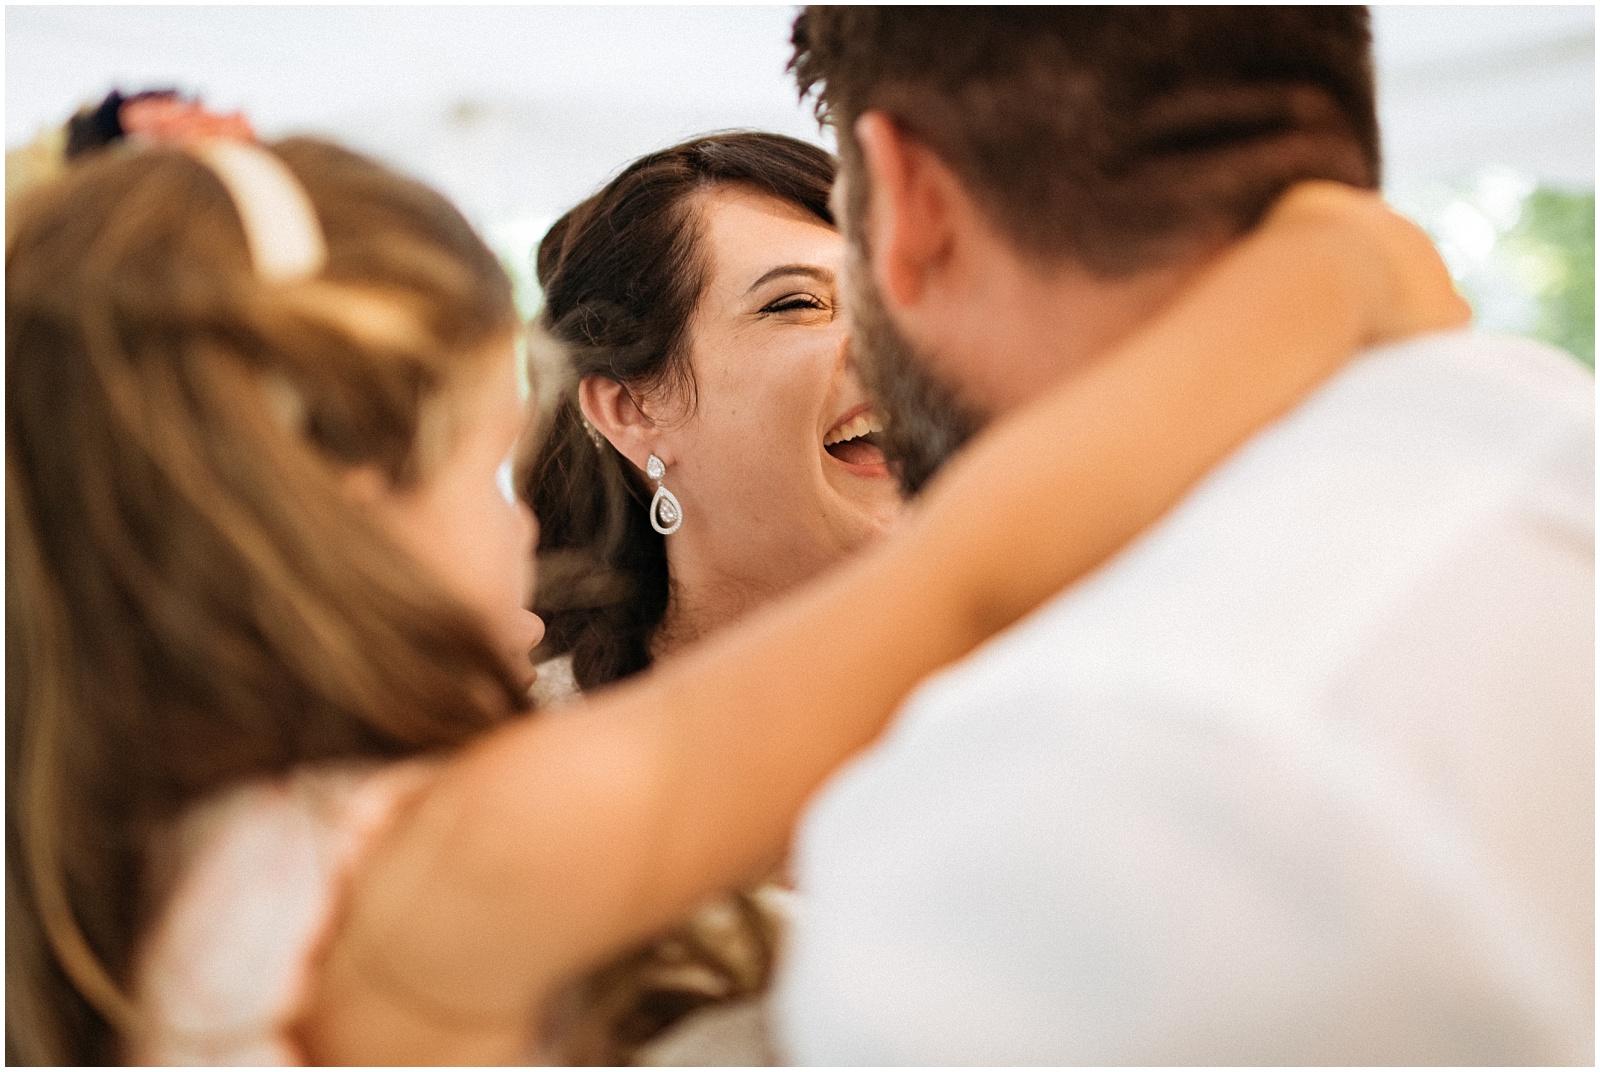 Ryan_Rechelle_Nantahalla_Weddings_Andrews_NC-161_Ryan_Rechelle_McGuire's_Millrace_Andrews_NC.jpg